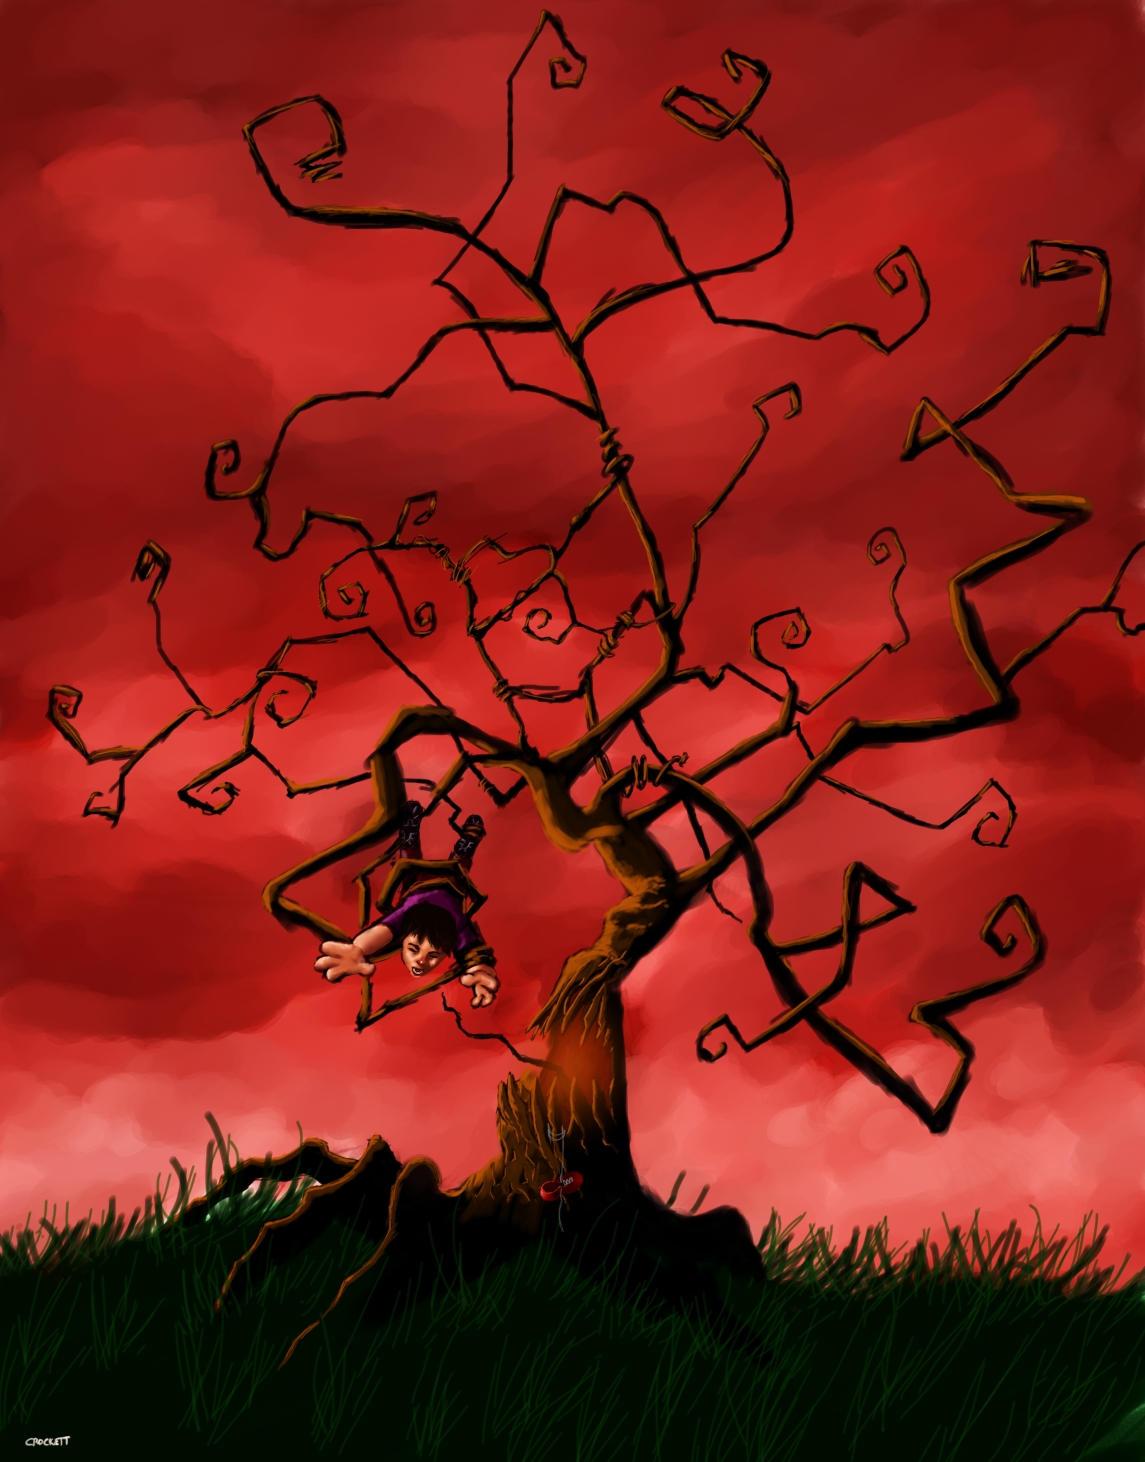 Unforgiving Tree by MotM32